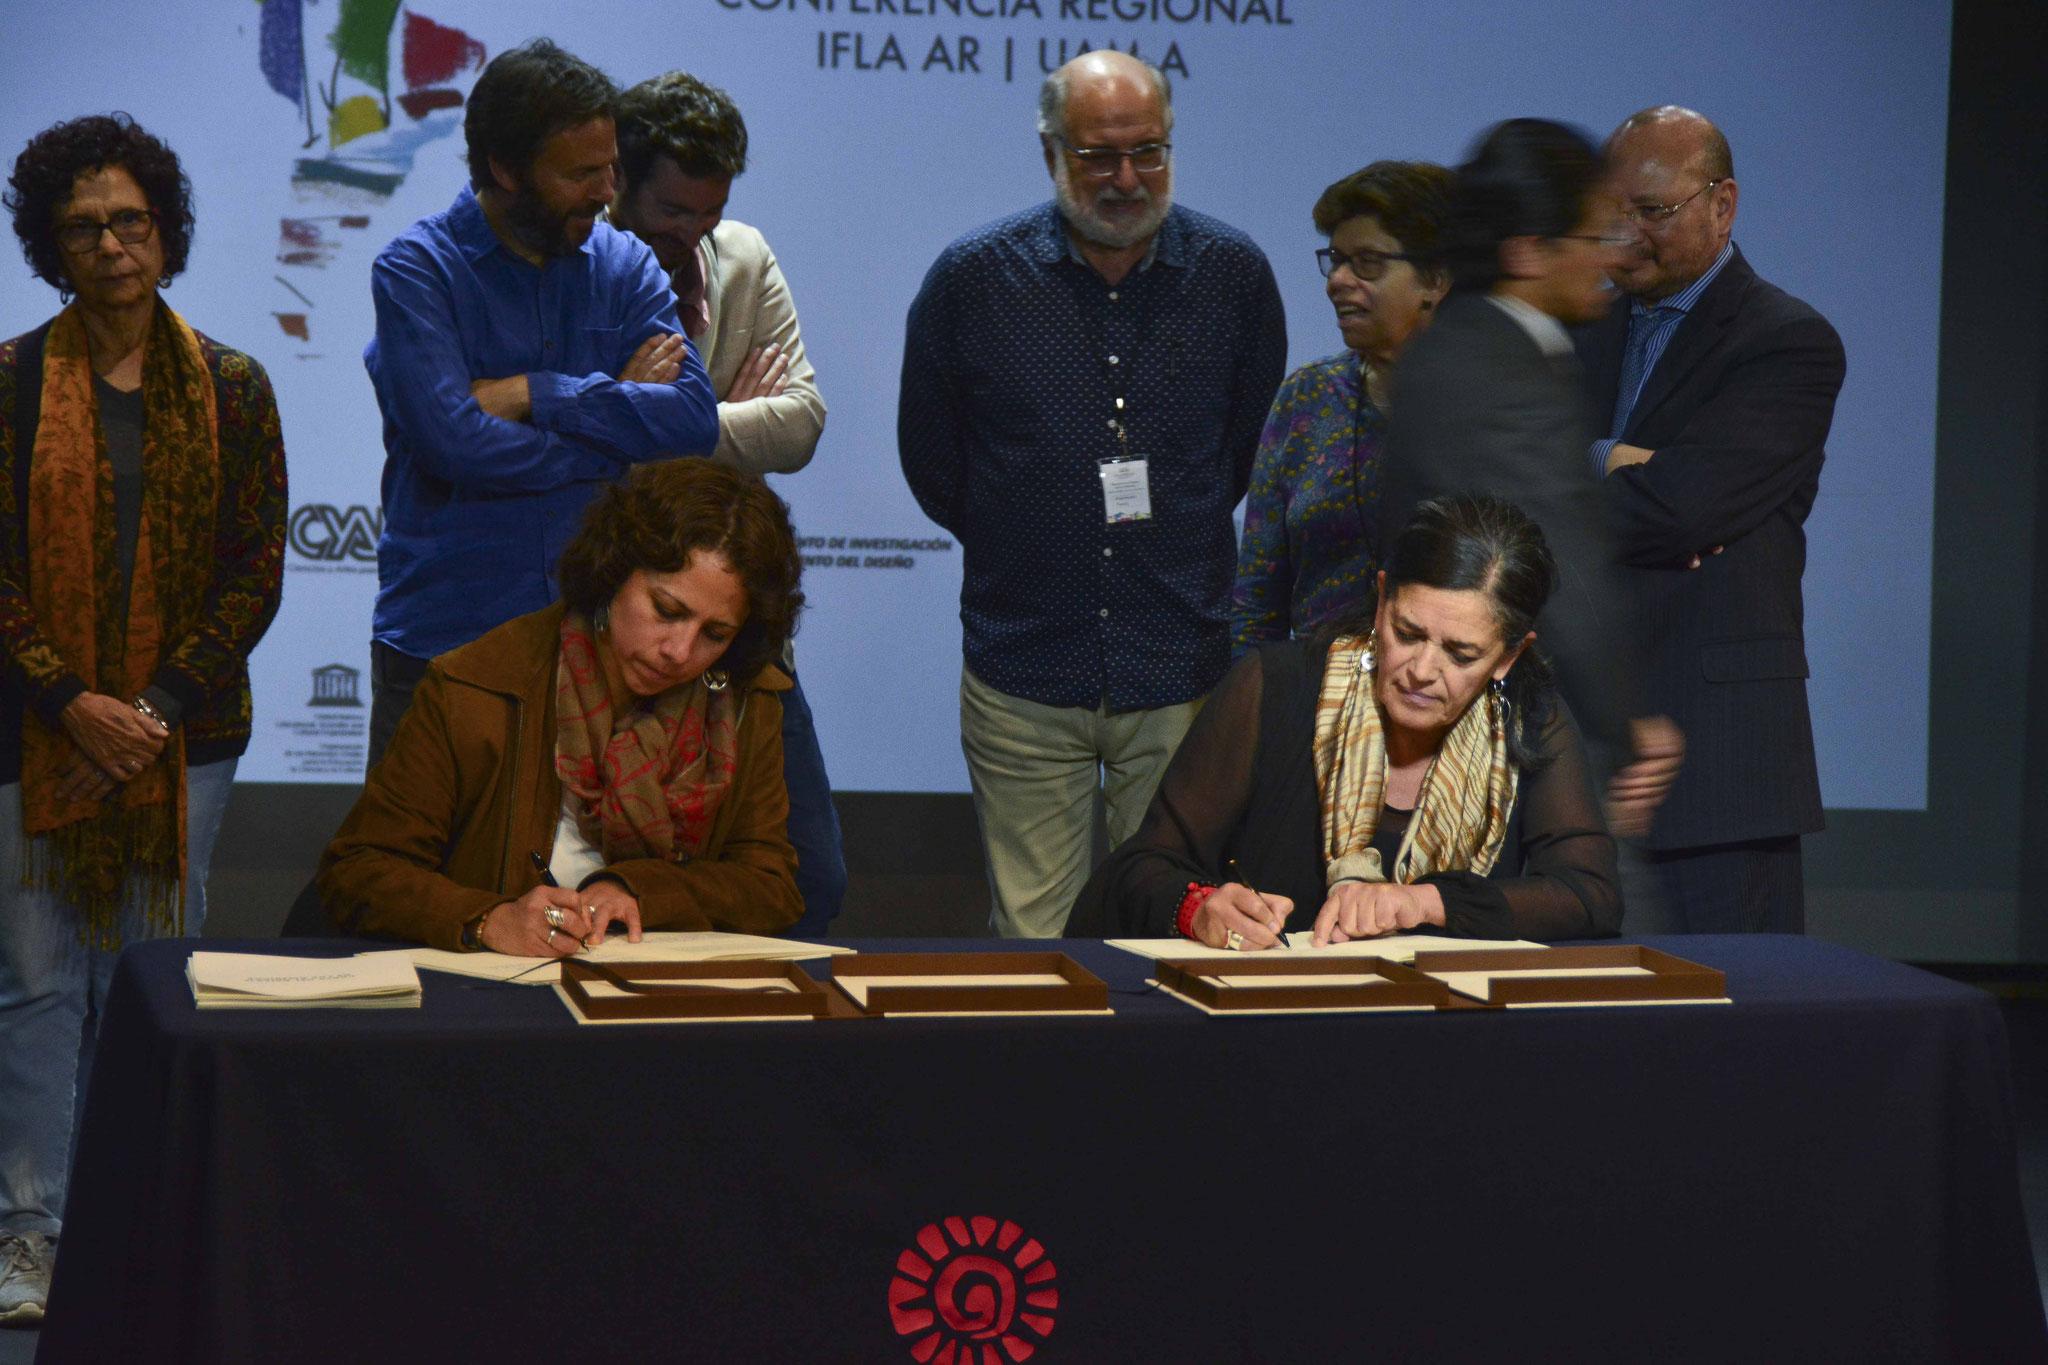 Firma de la Carta del Paisaje de las Américas / Mtra. Mónica Pallares, Arq. Psj. Raquel Peñalosa